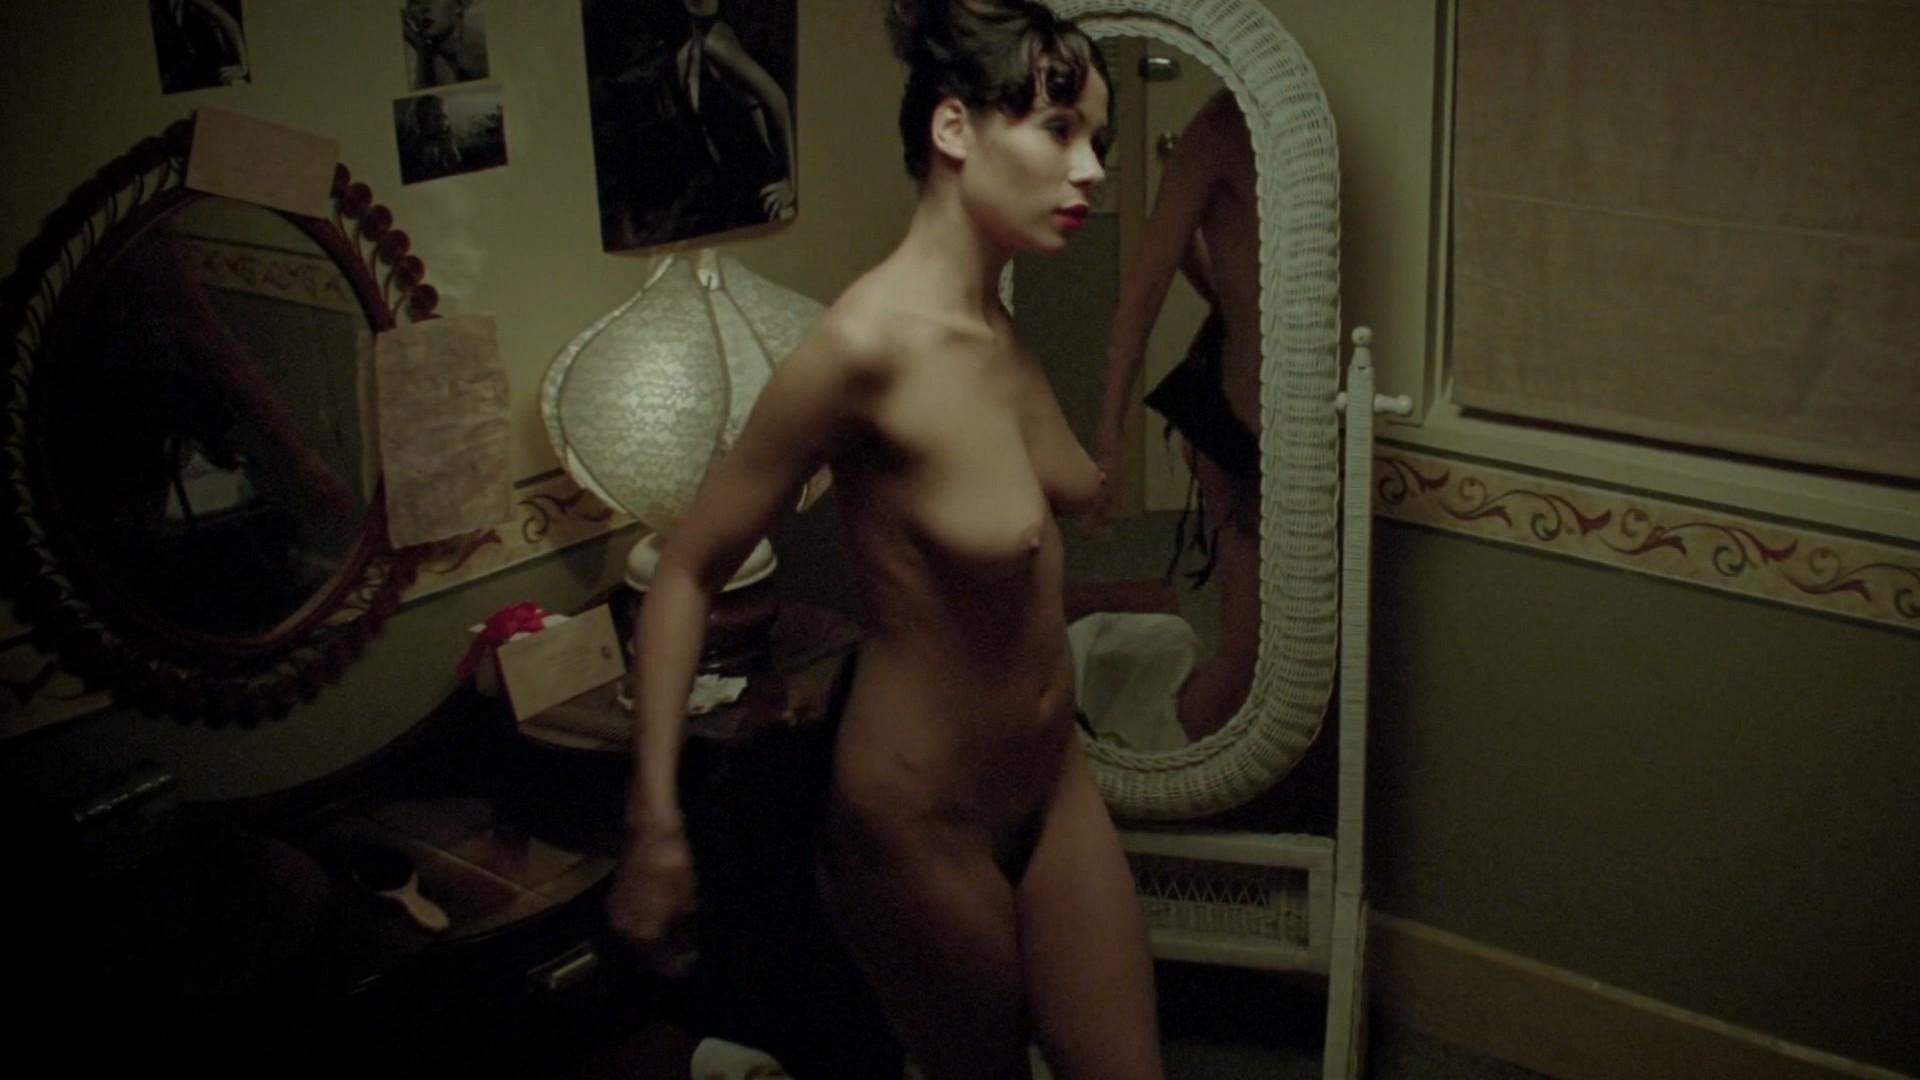 Cassandra-Swaby-Nude-3-1